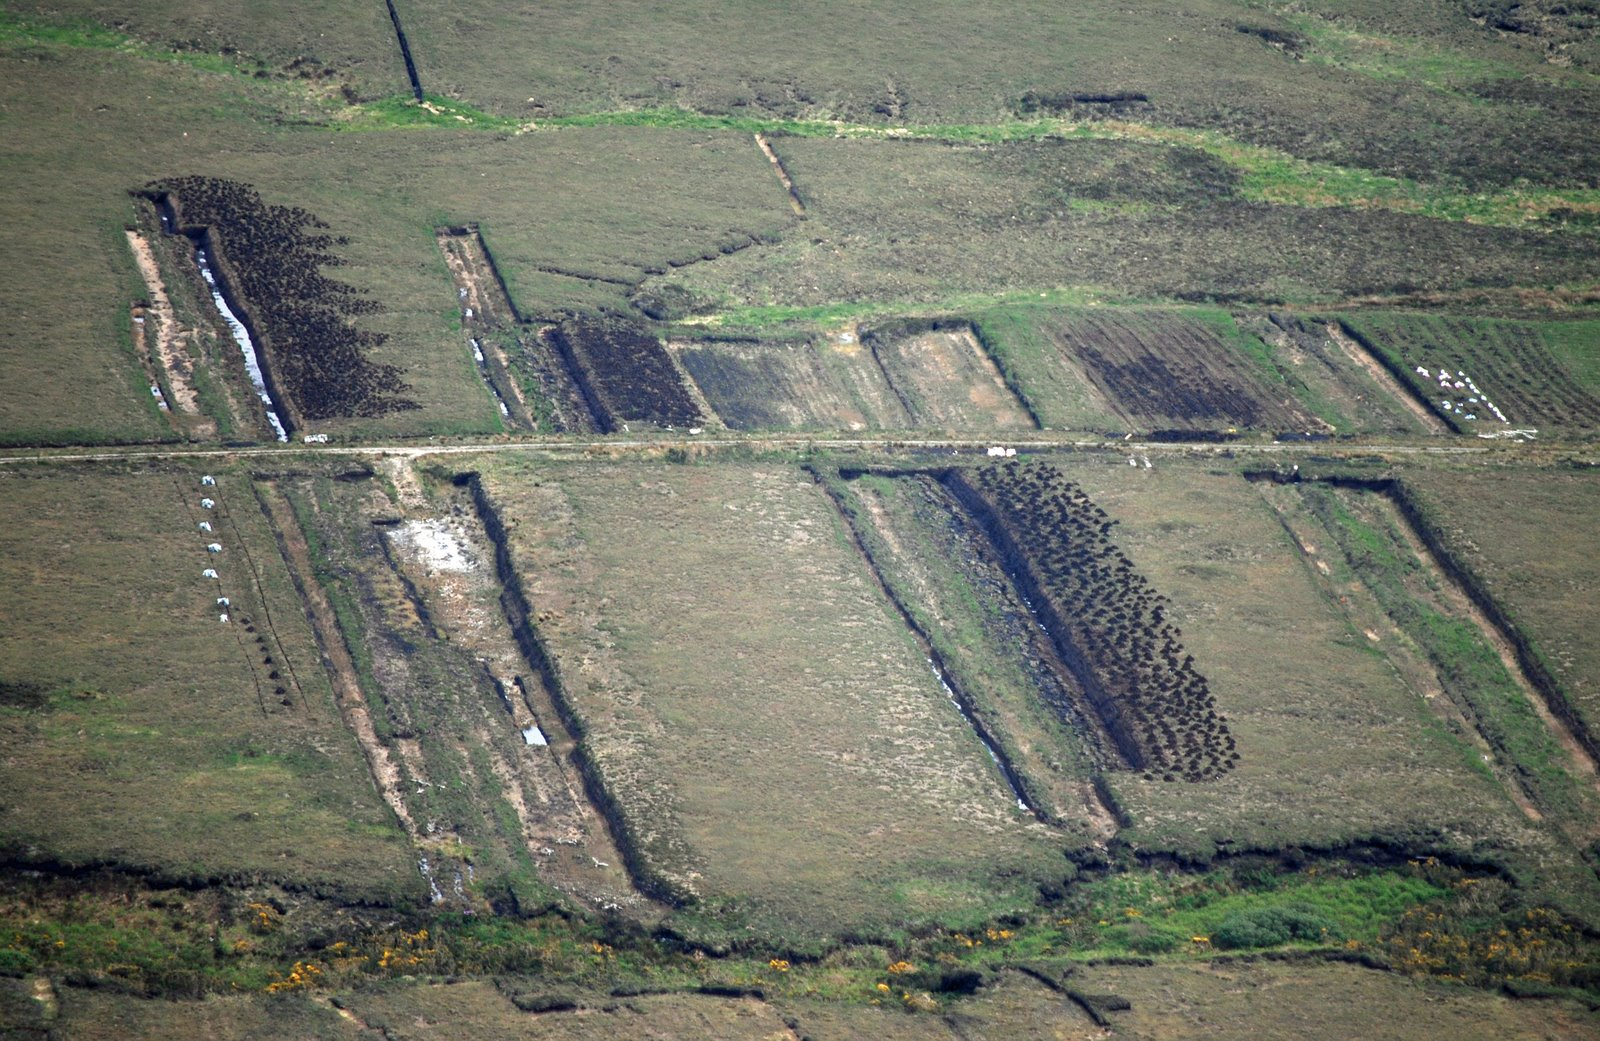 peat bog, achill island, ireland